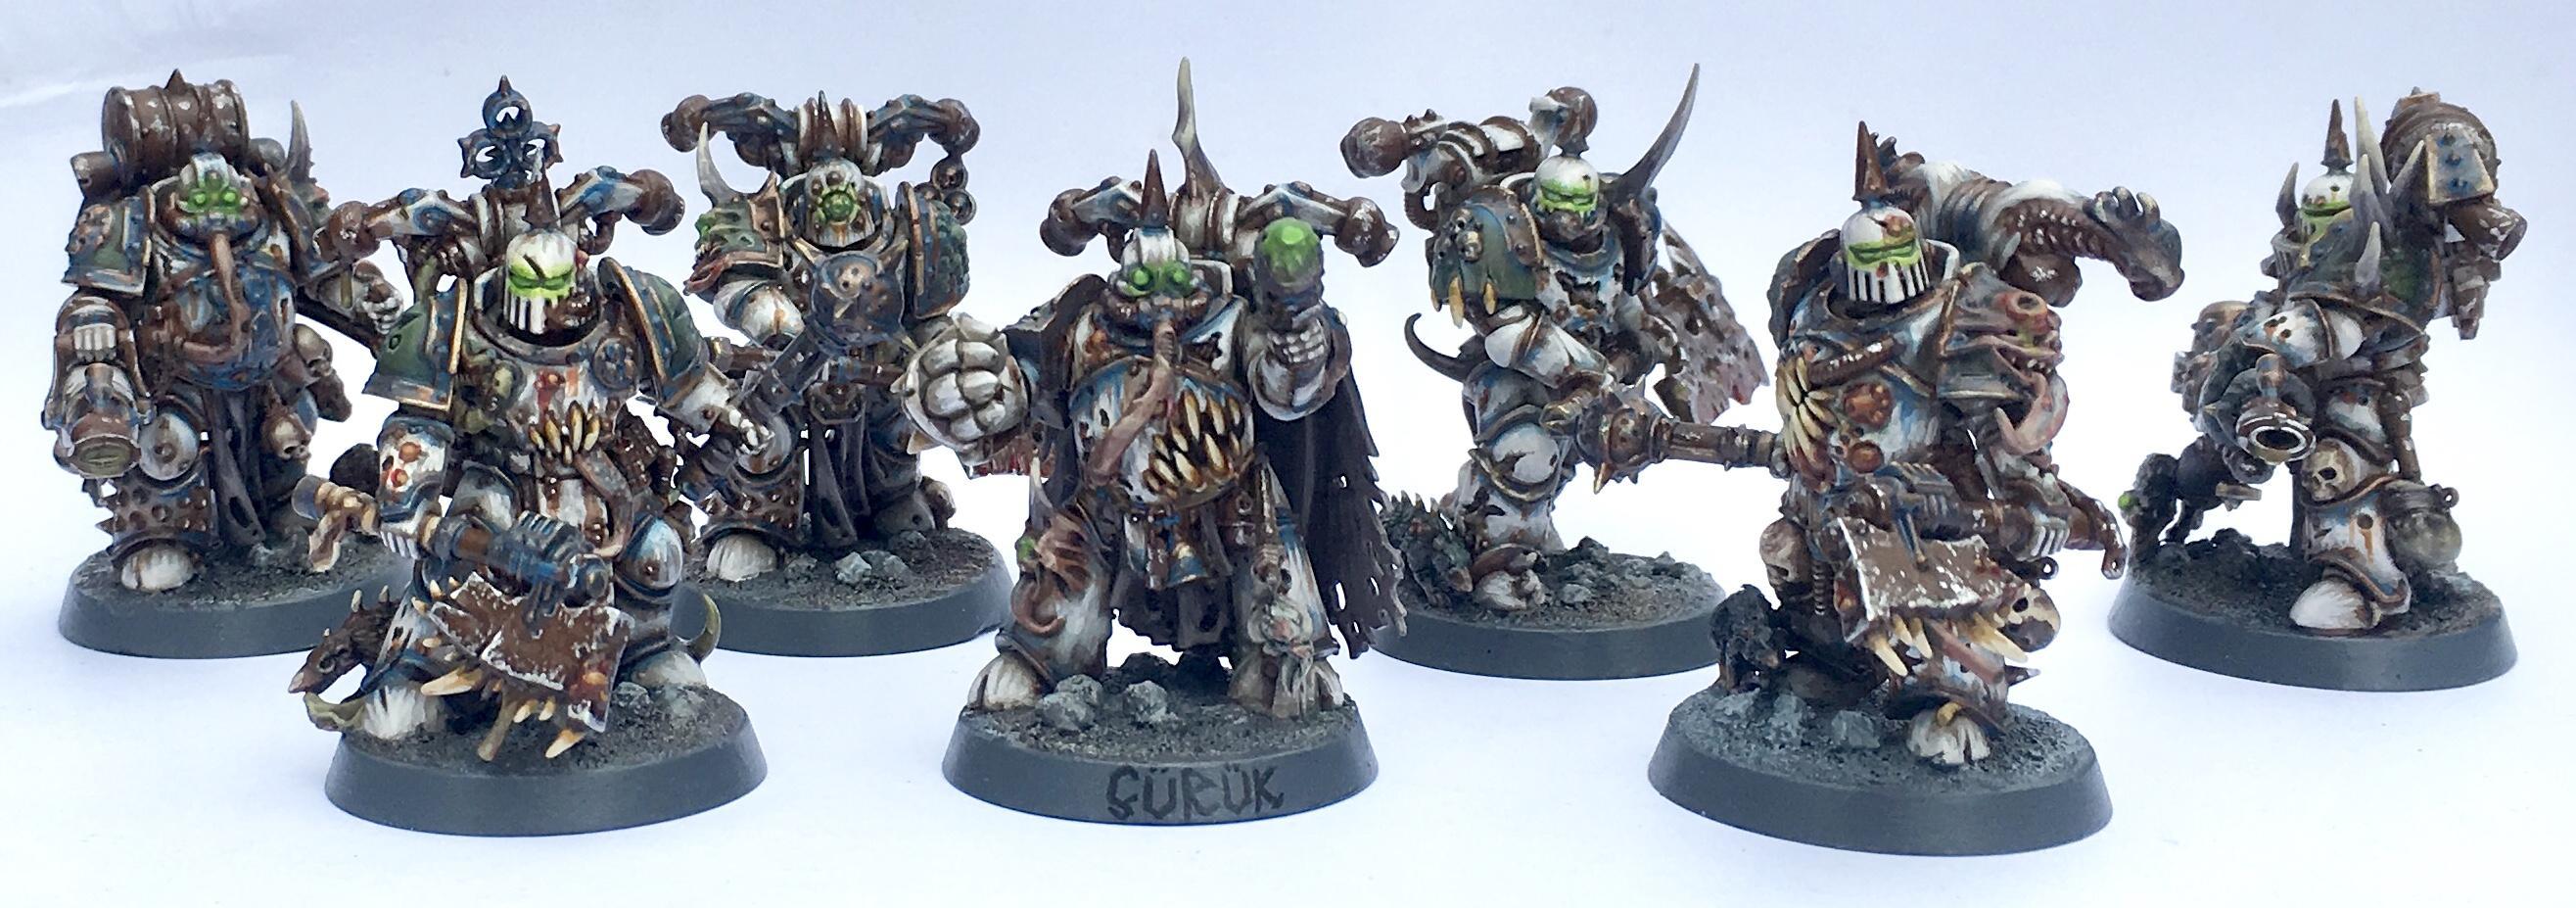 Chaos, Chaos Space Marines, Death Guard, Nurgle, Plague Marines